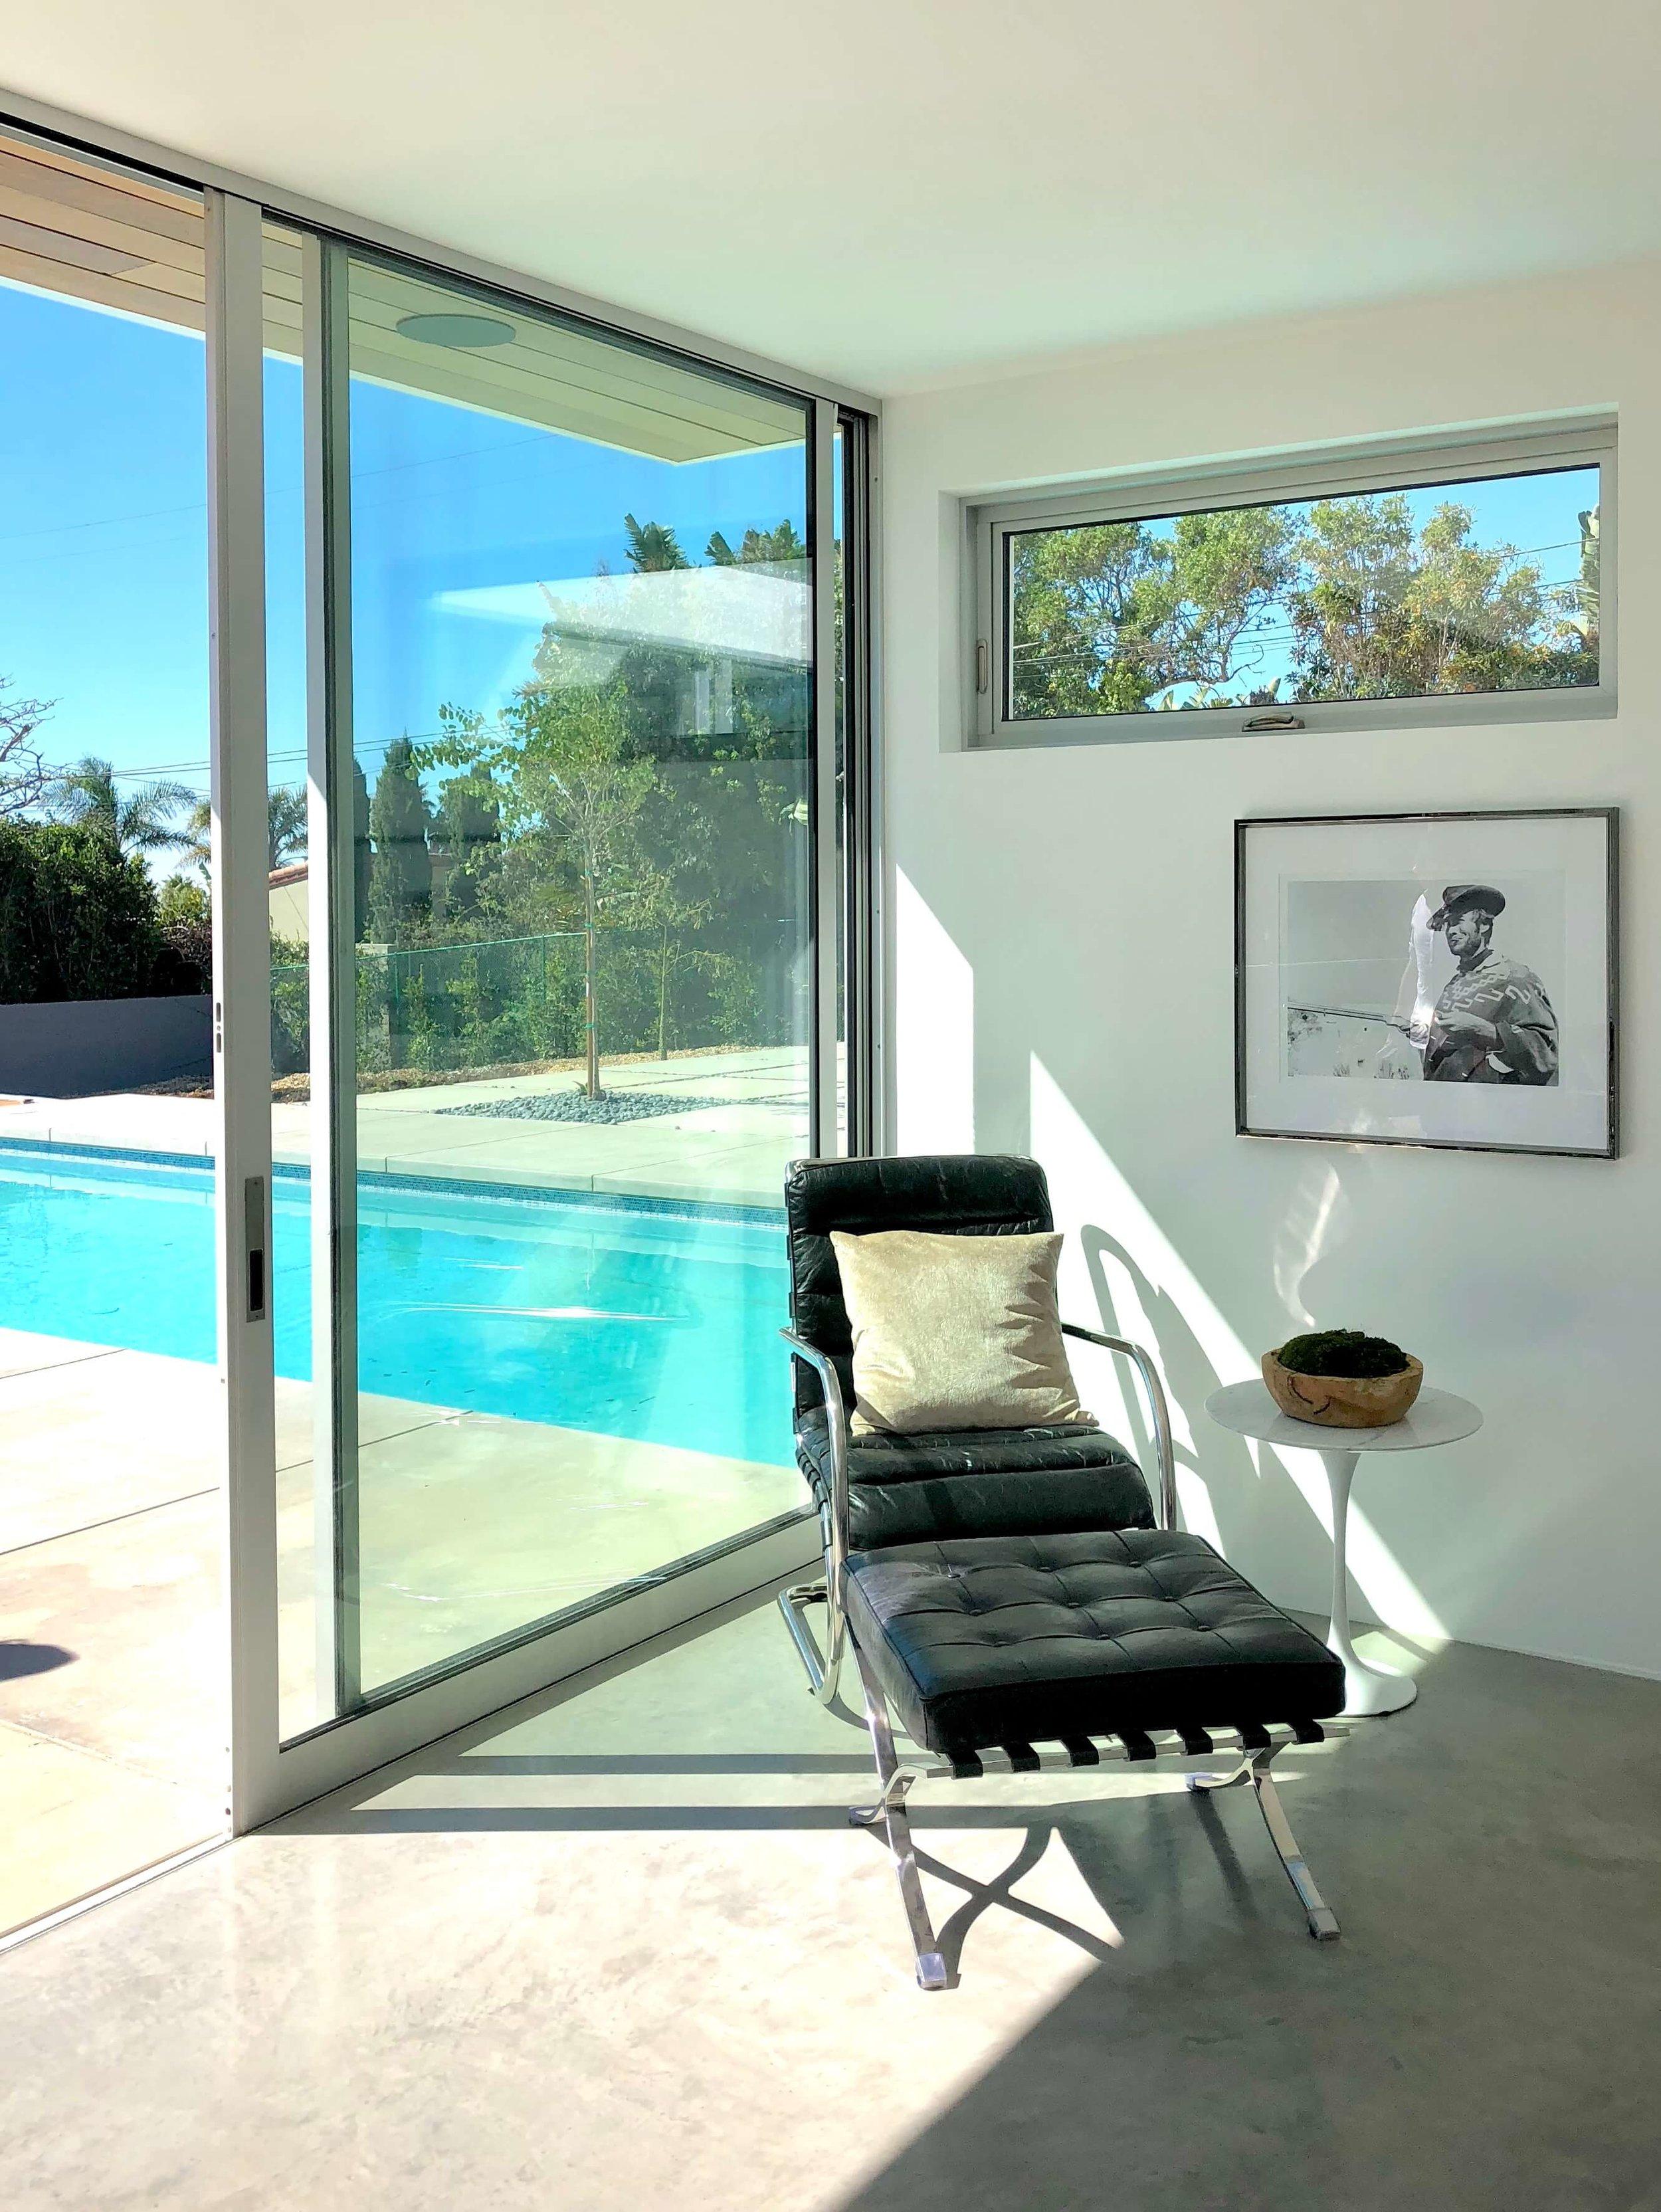 California contemporary design - Dwell on Design's Fall Home Tour, Designer: Vitus Mitare #contemporaryarchitecture #slidingglassdoor